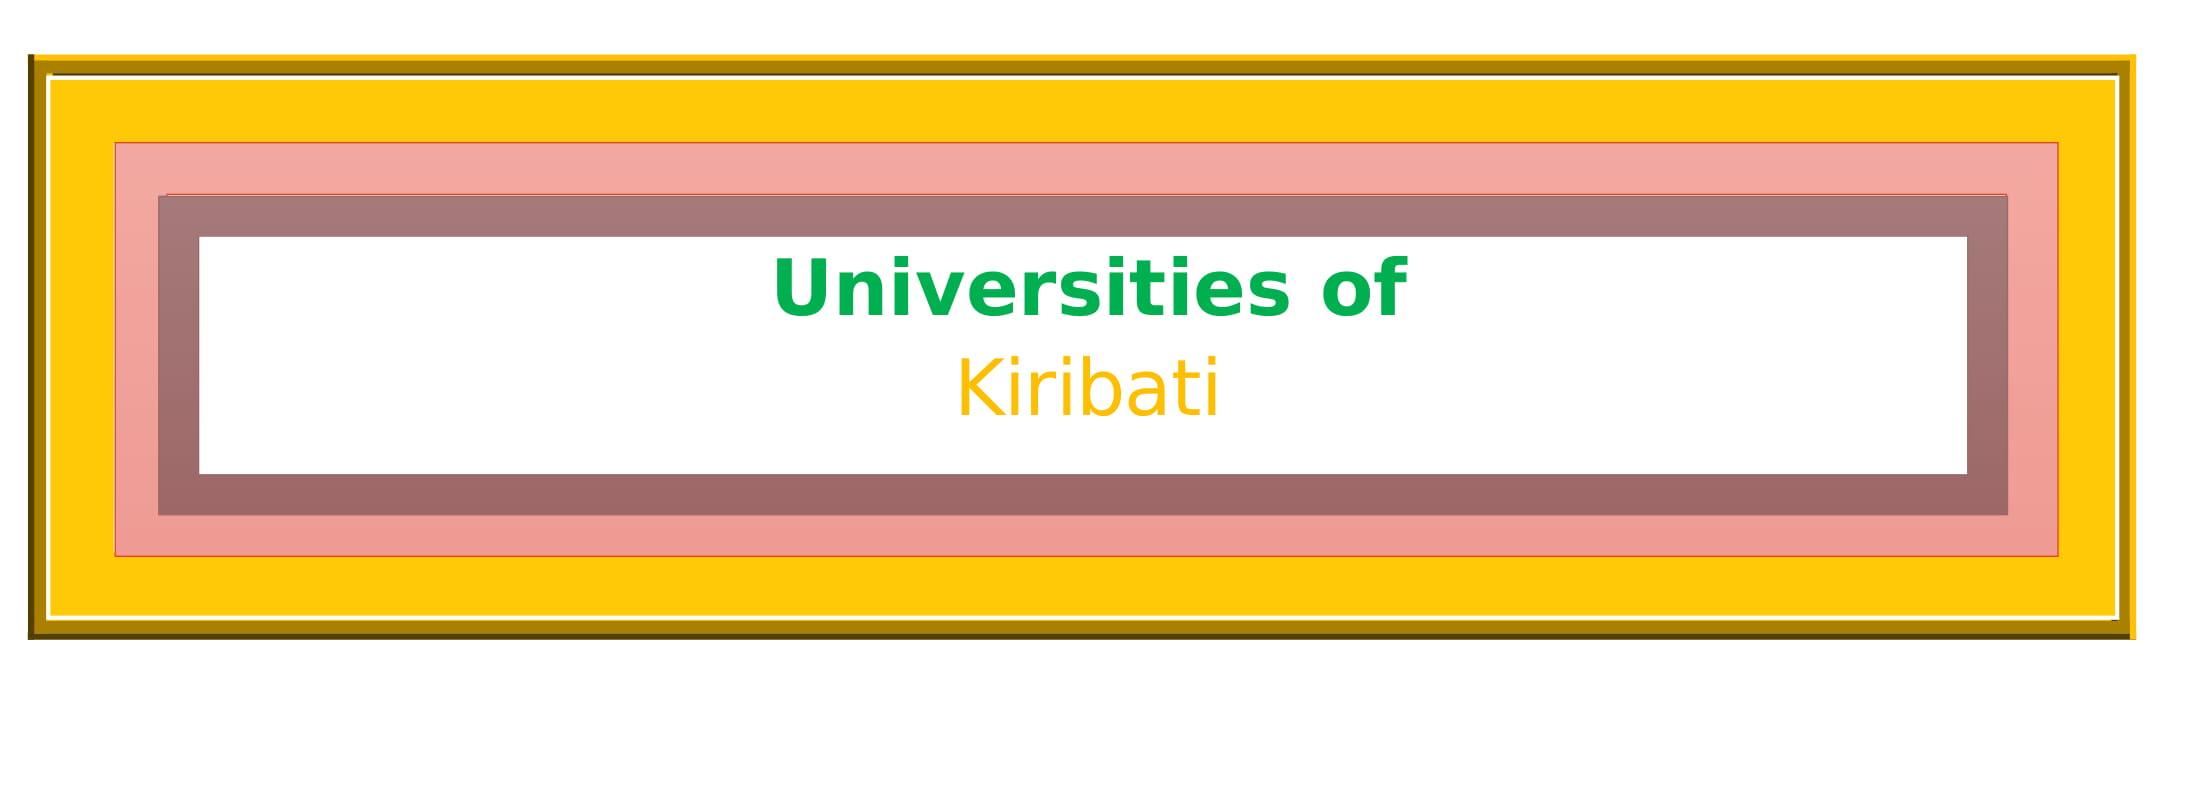 List of Universities in Kiribati